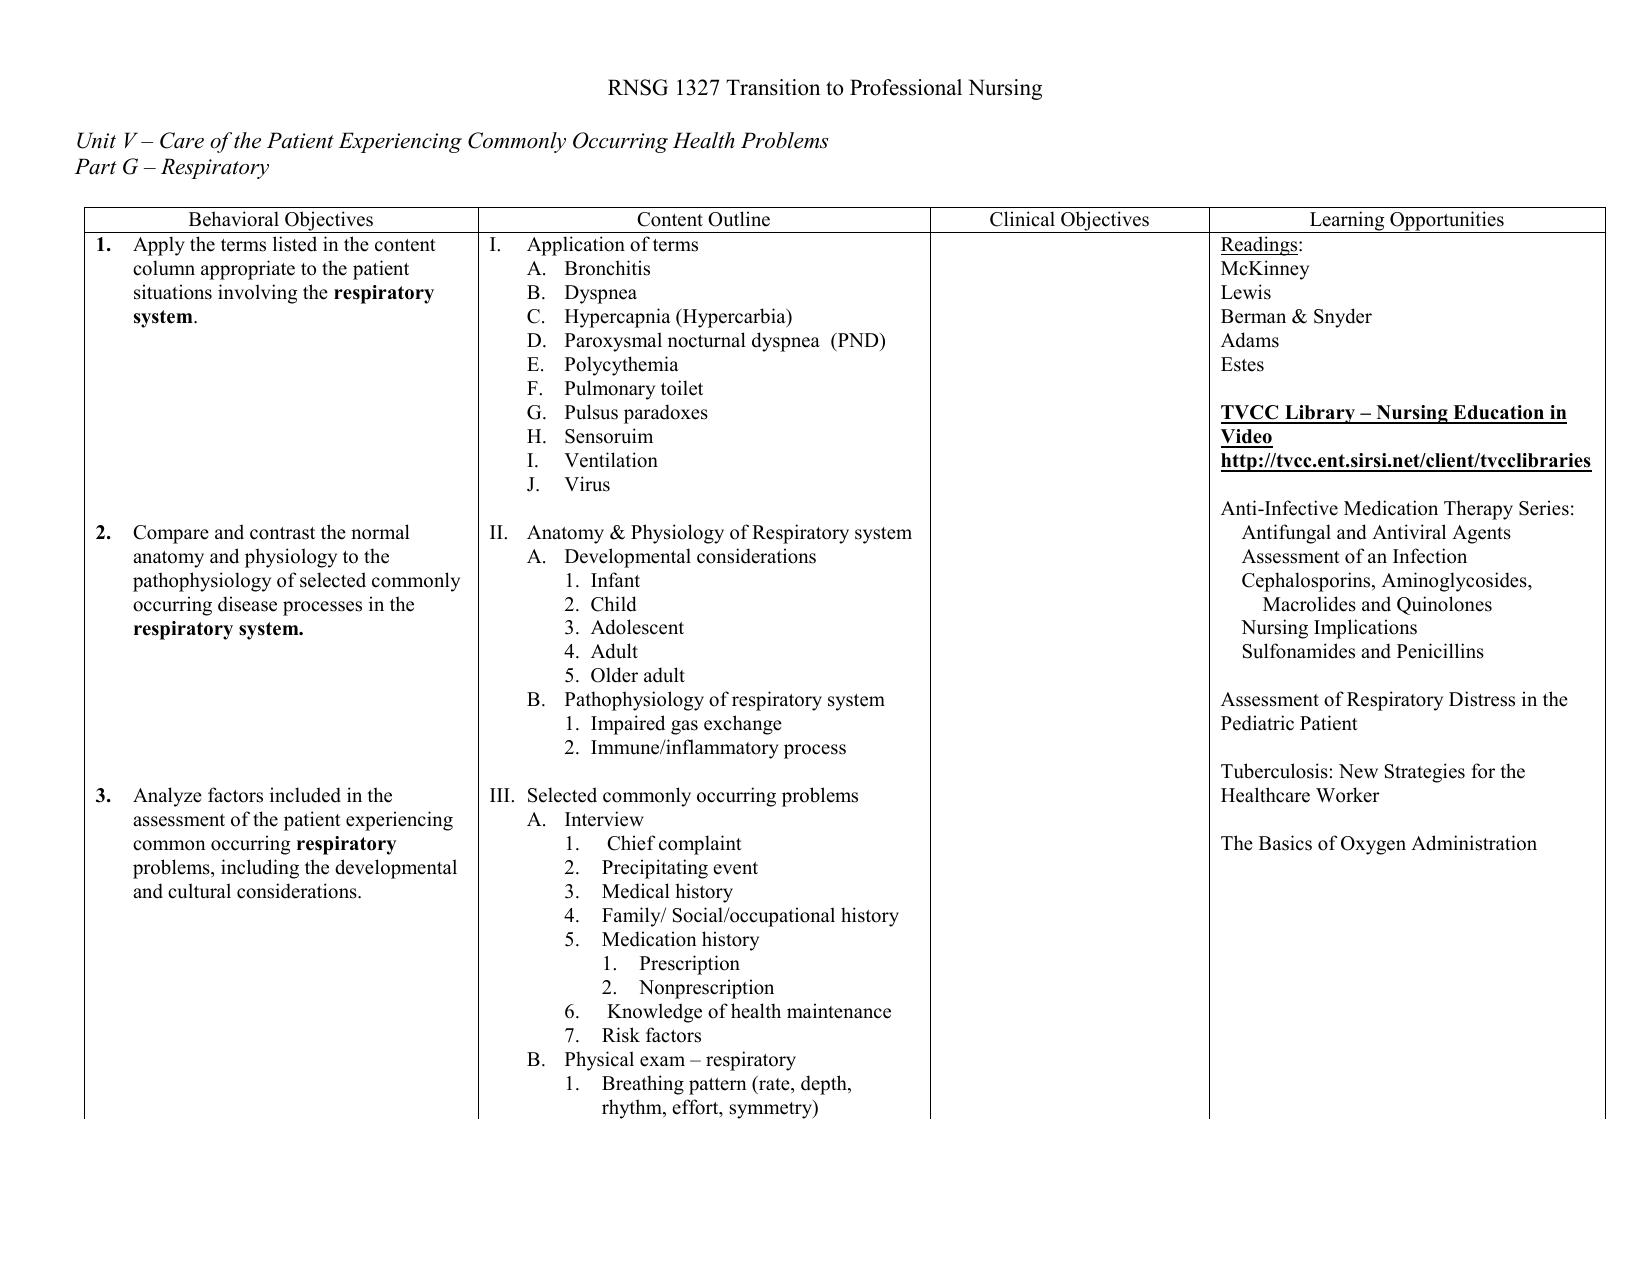 Part G: Respiratory System